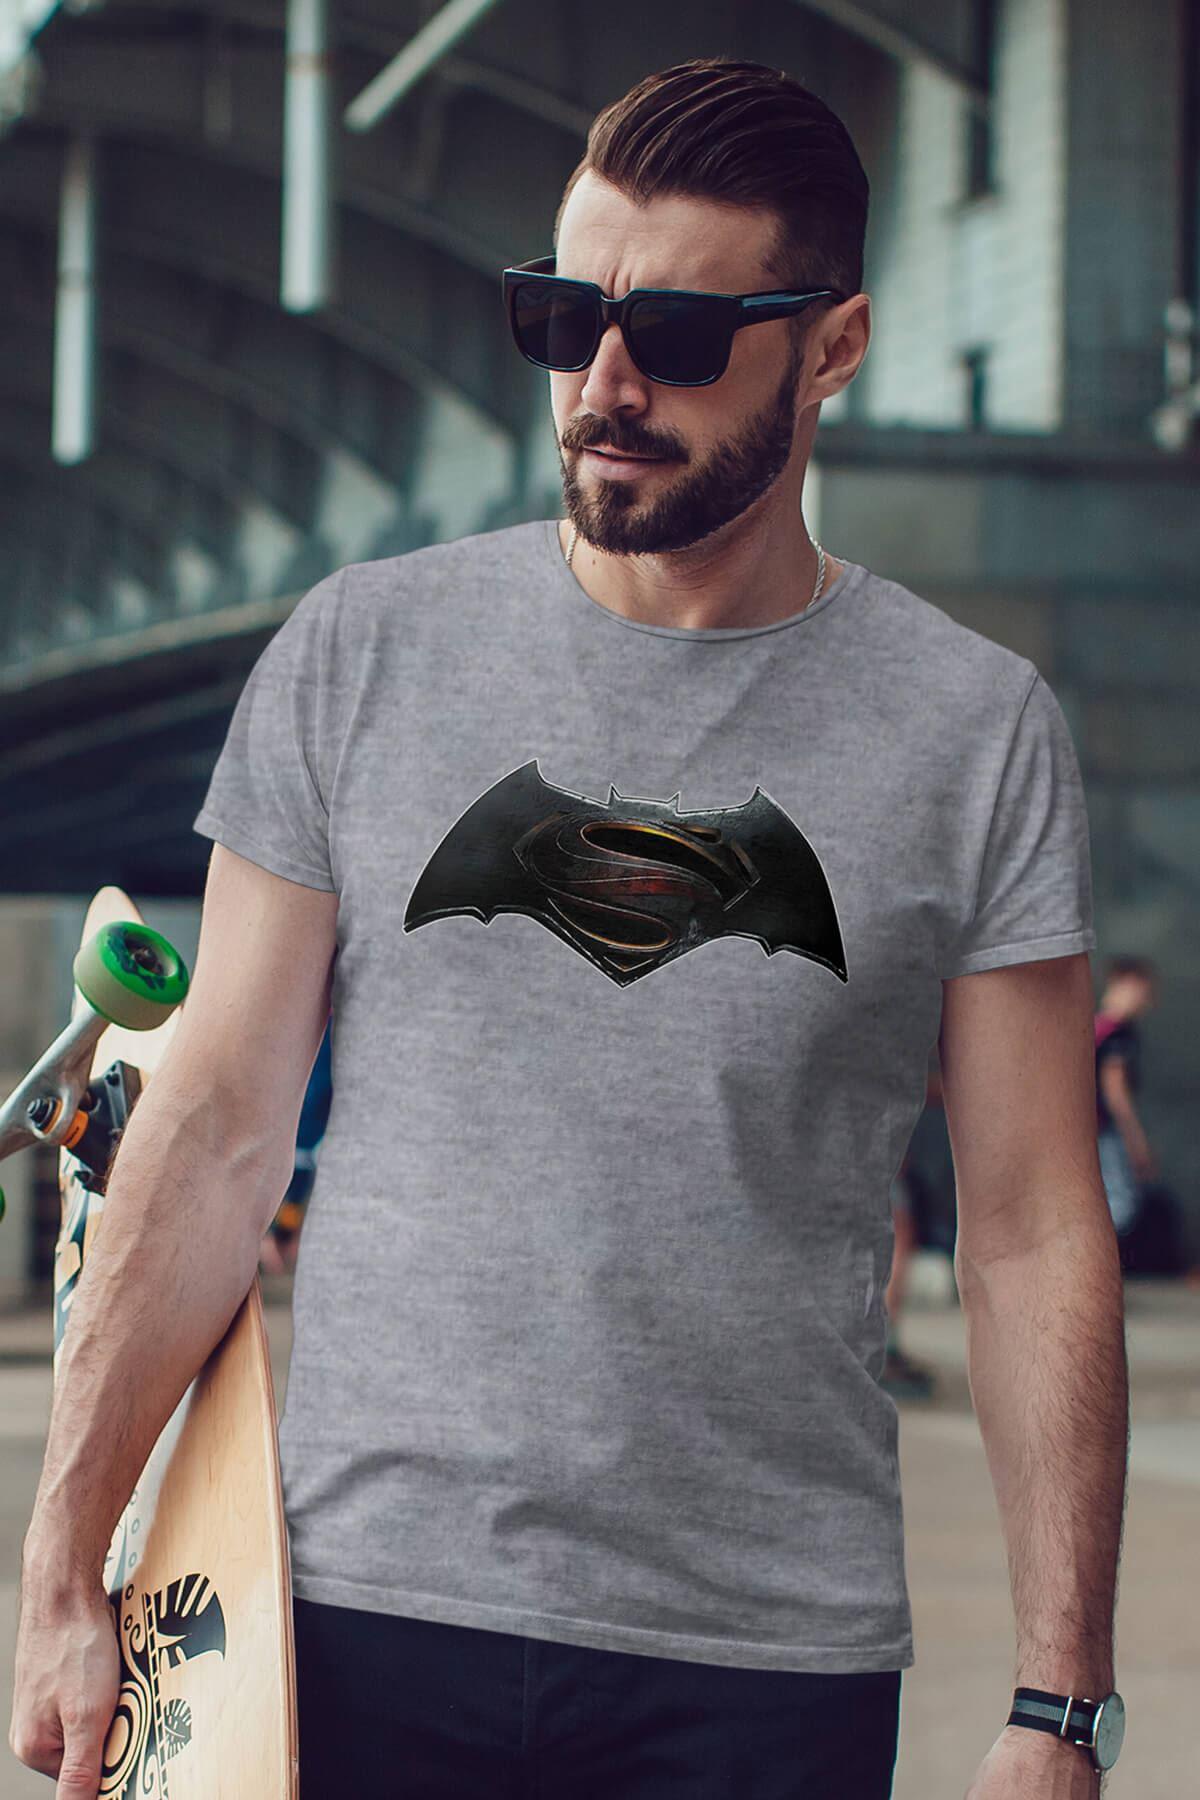 Batman Gri Erkek Tshirt - Tişört